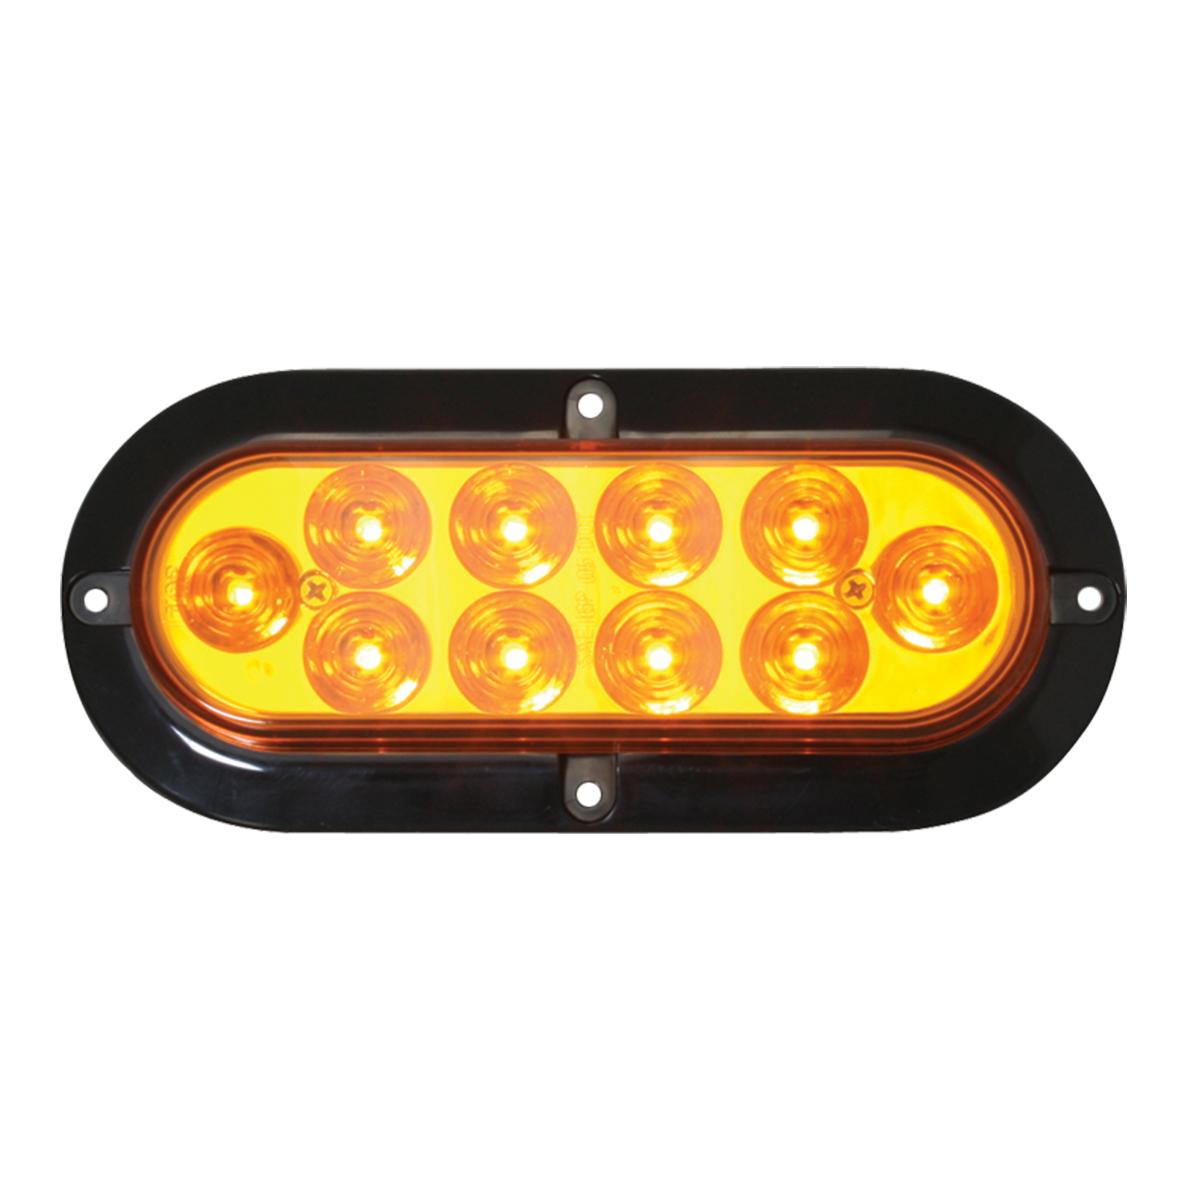 stop lamp led grand new veloz keluhan surface mount oval mega 10 plus light general